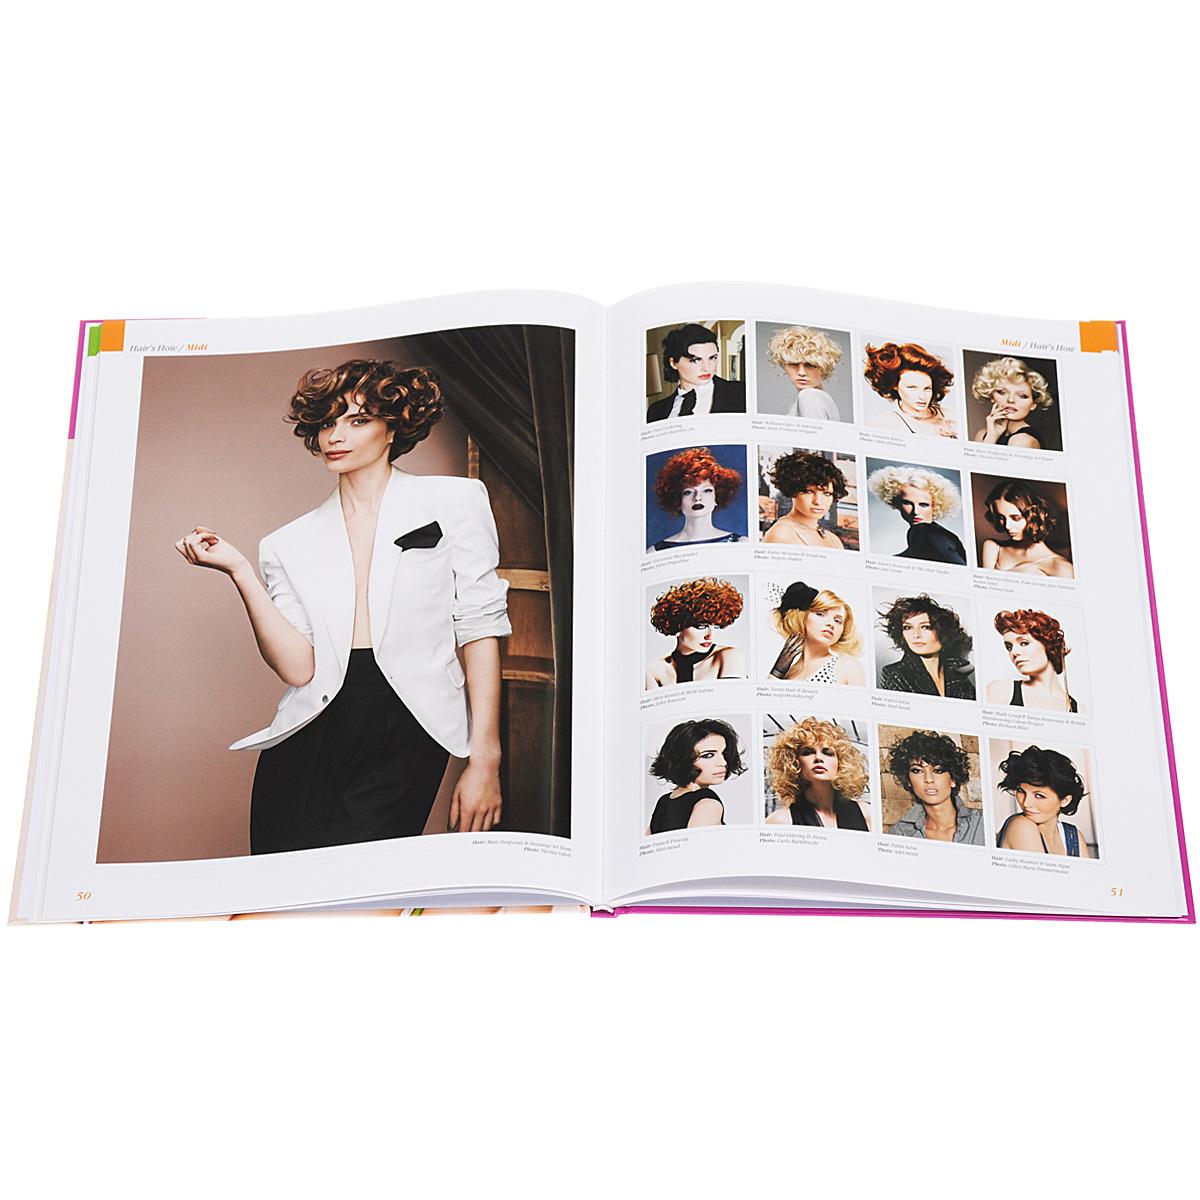 Hair's How. 1000 причесок. Книга 3 (+ приложение)